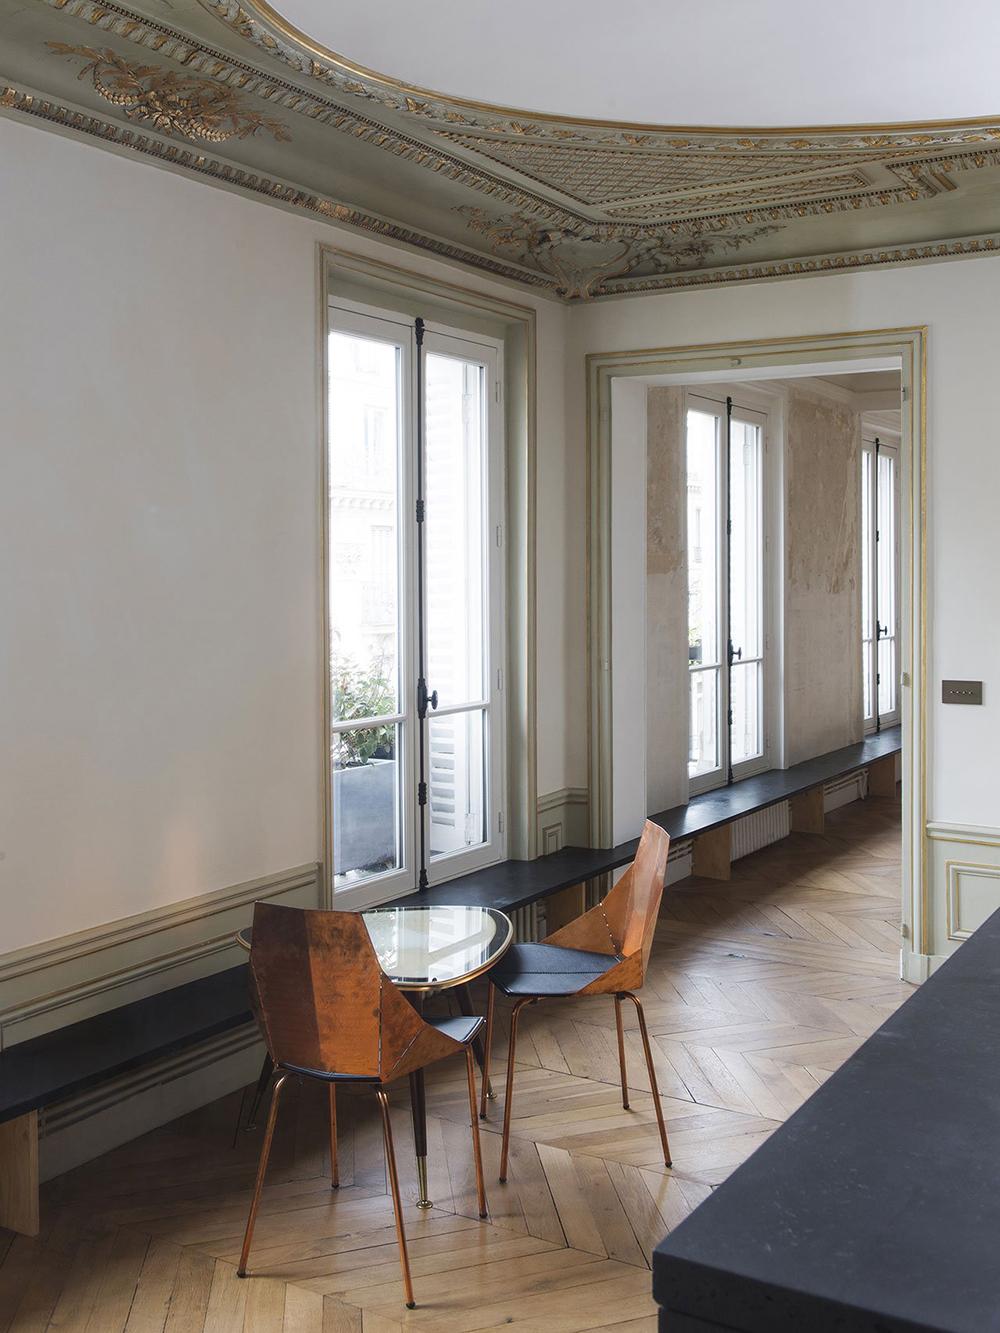 Interiors, Paris, Apartment, Inspiration, Home, living. Decor, Timber, White Walls, Mirror,